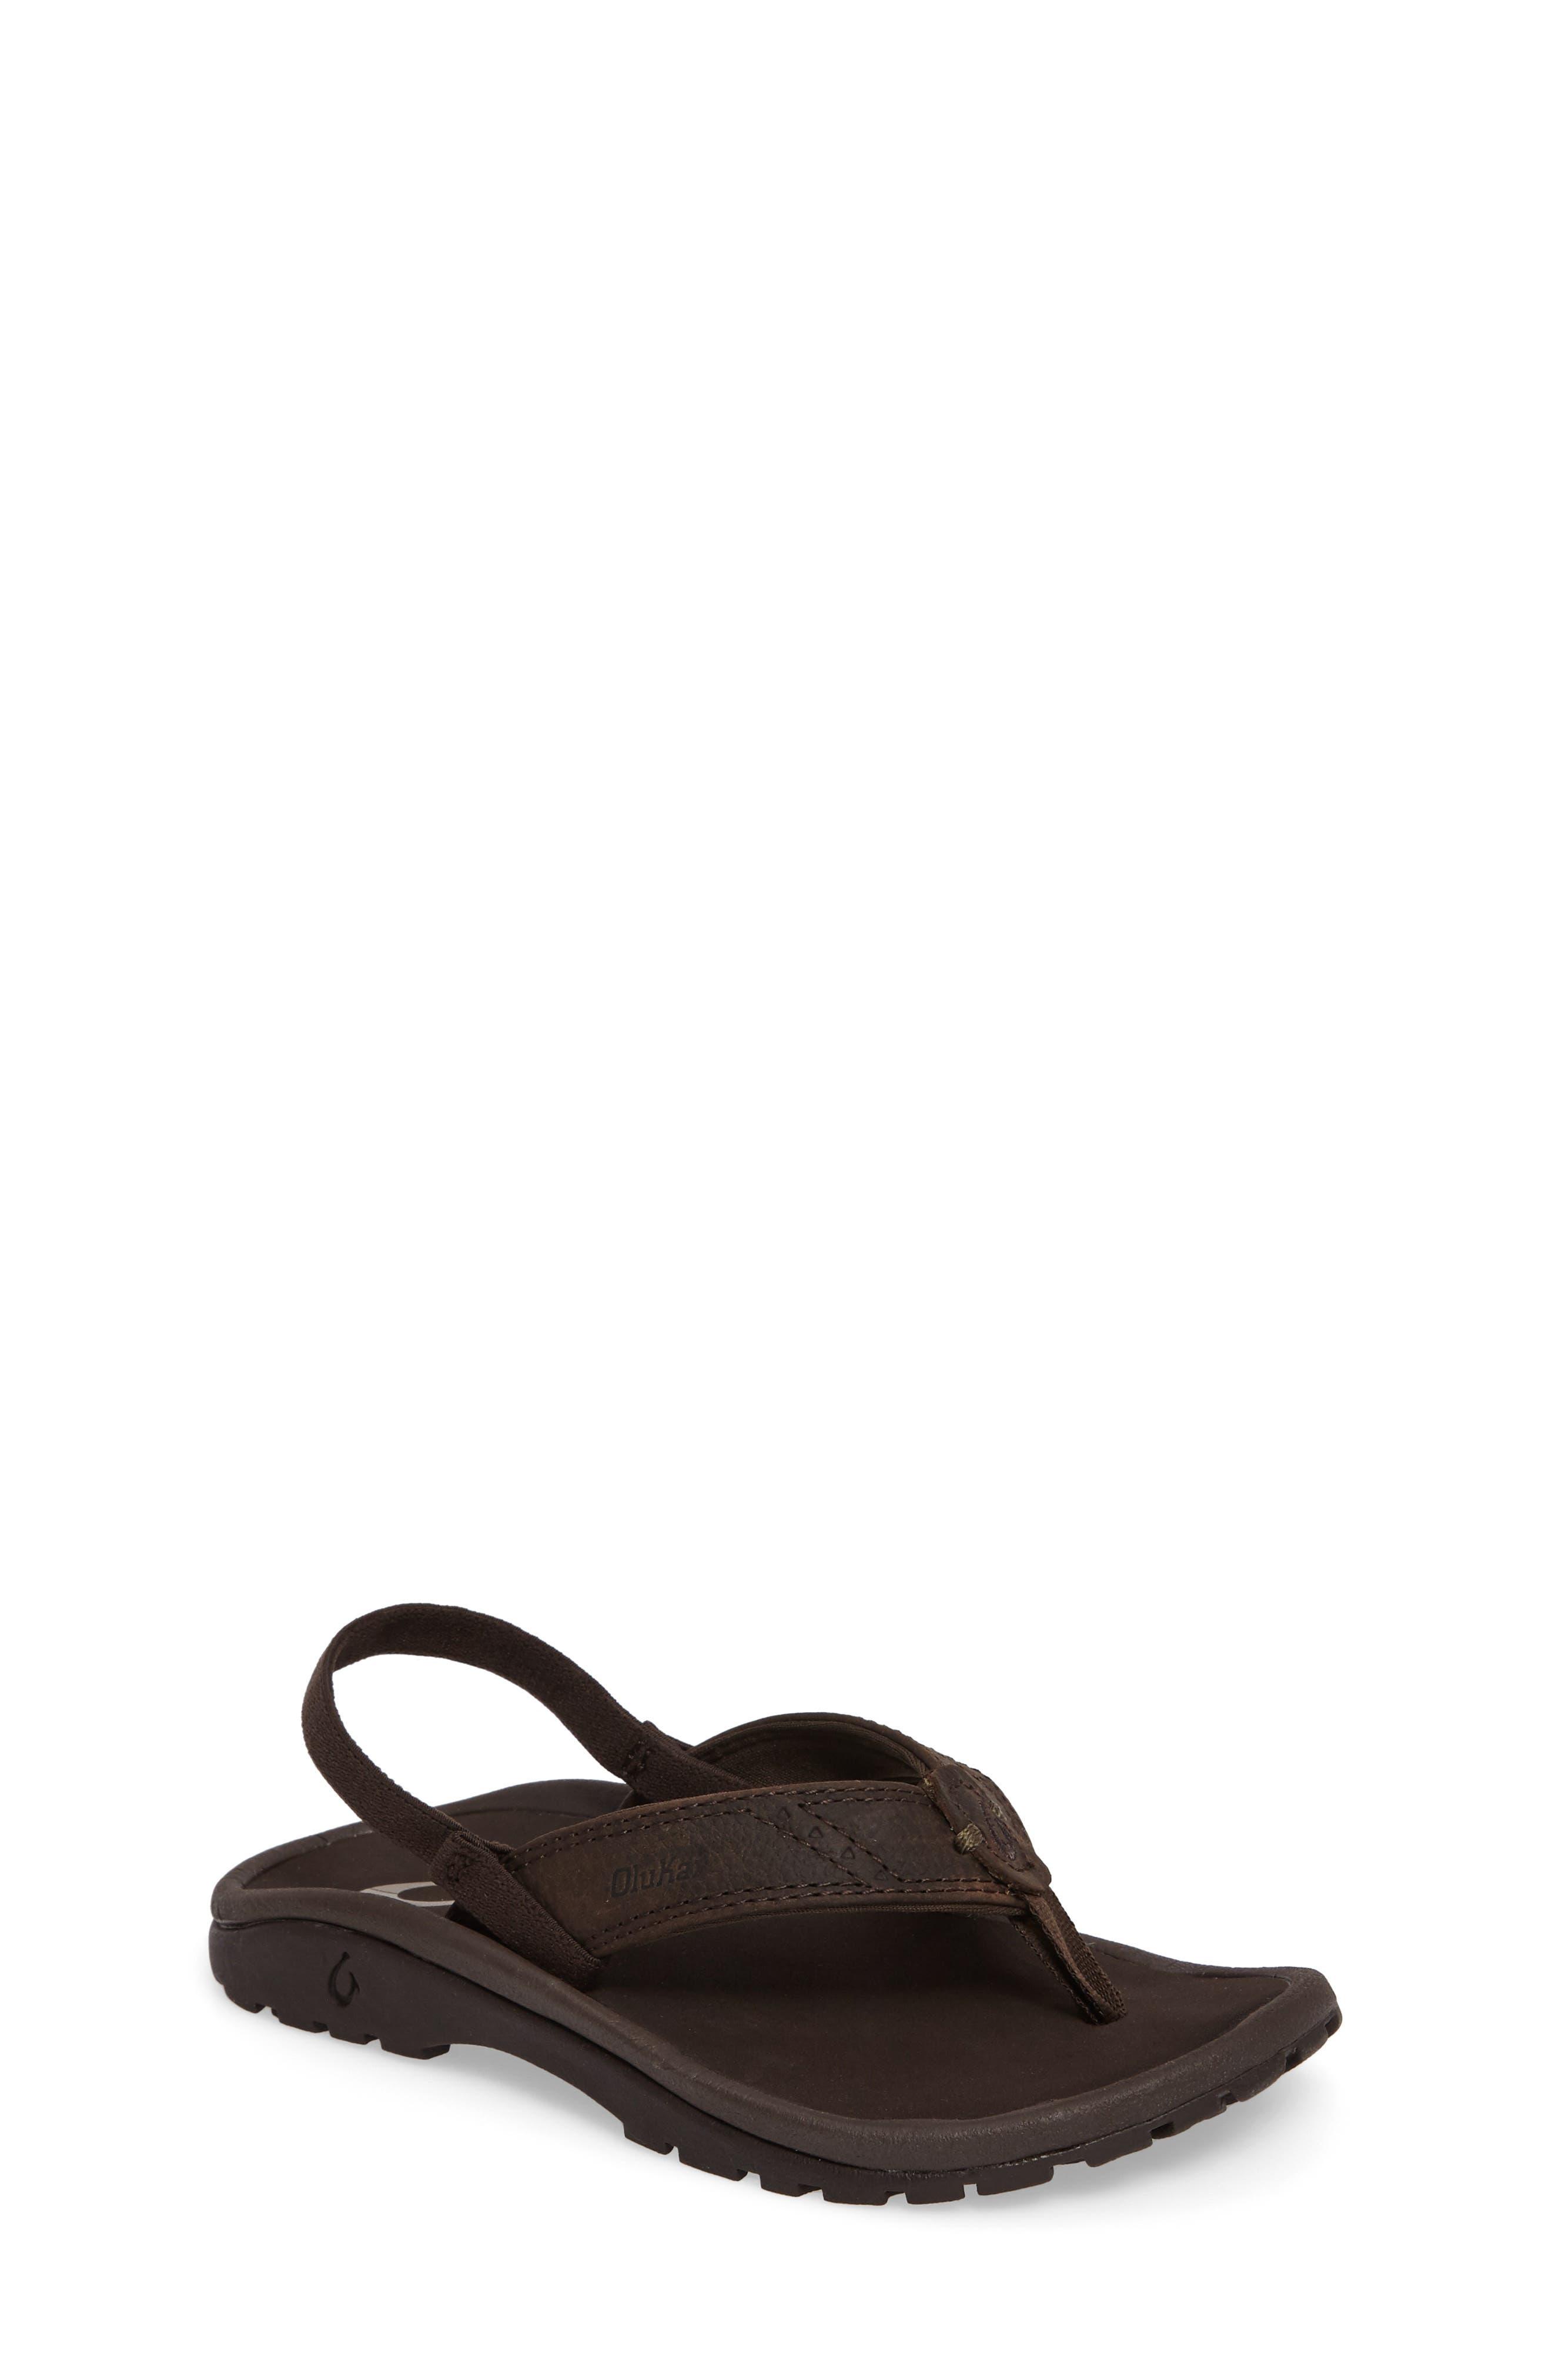 OLUKAI Nui Leather Sandal, Main, color, SEAL BROWN/ DARK JAVA